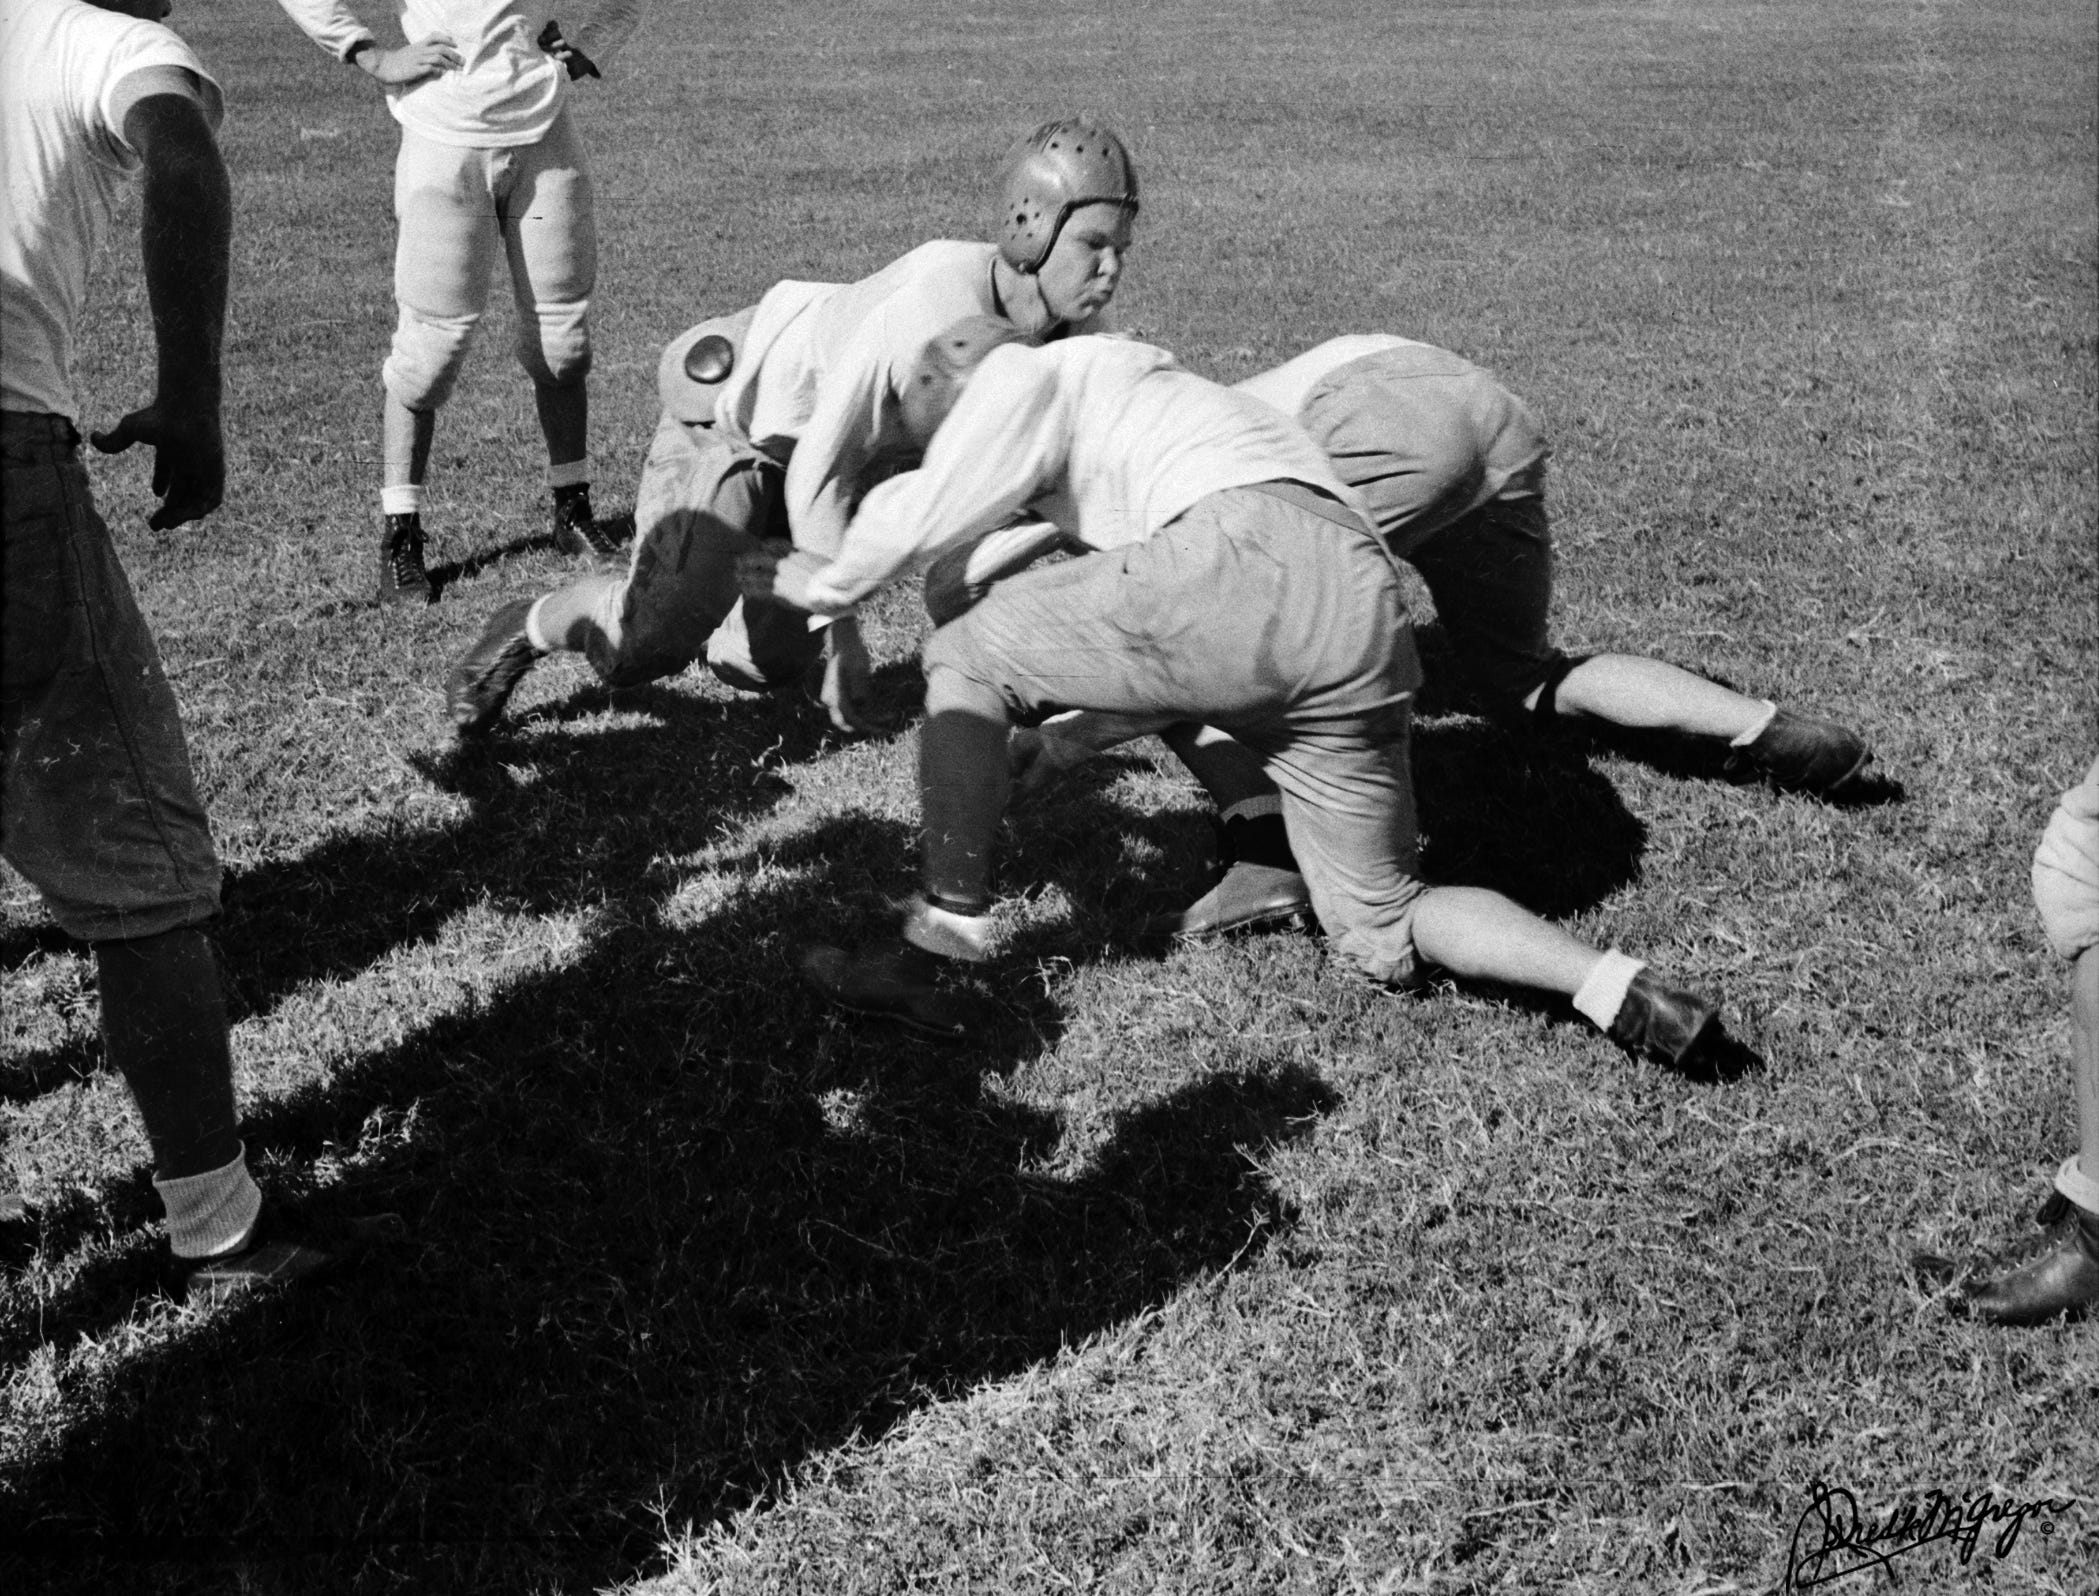 Members of the Corpus Christi High School football team practice at Buccaneer Stadium. 1 Battlin Buc Blvd, Corpus Christi. September 26, 1941.